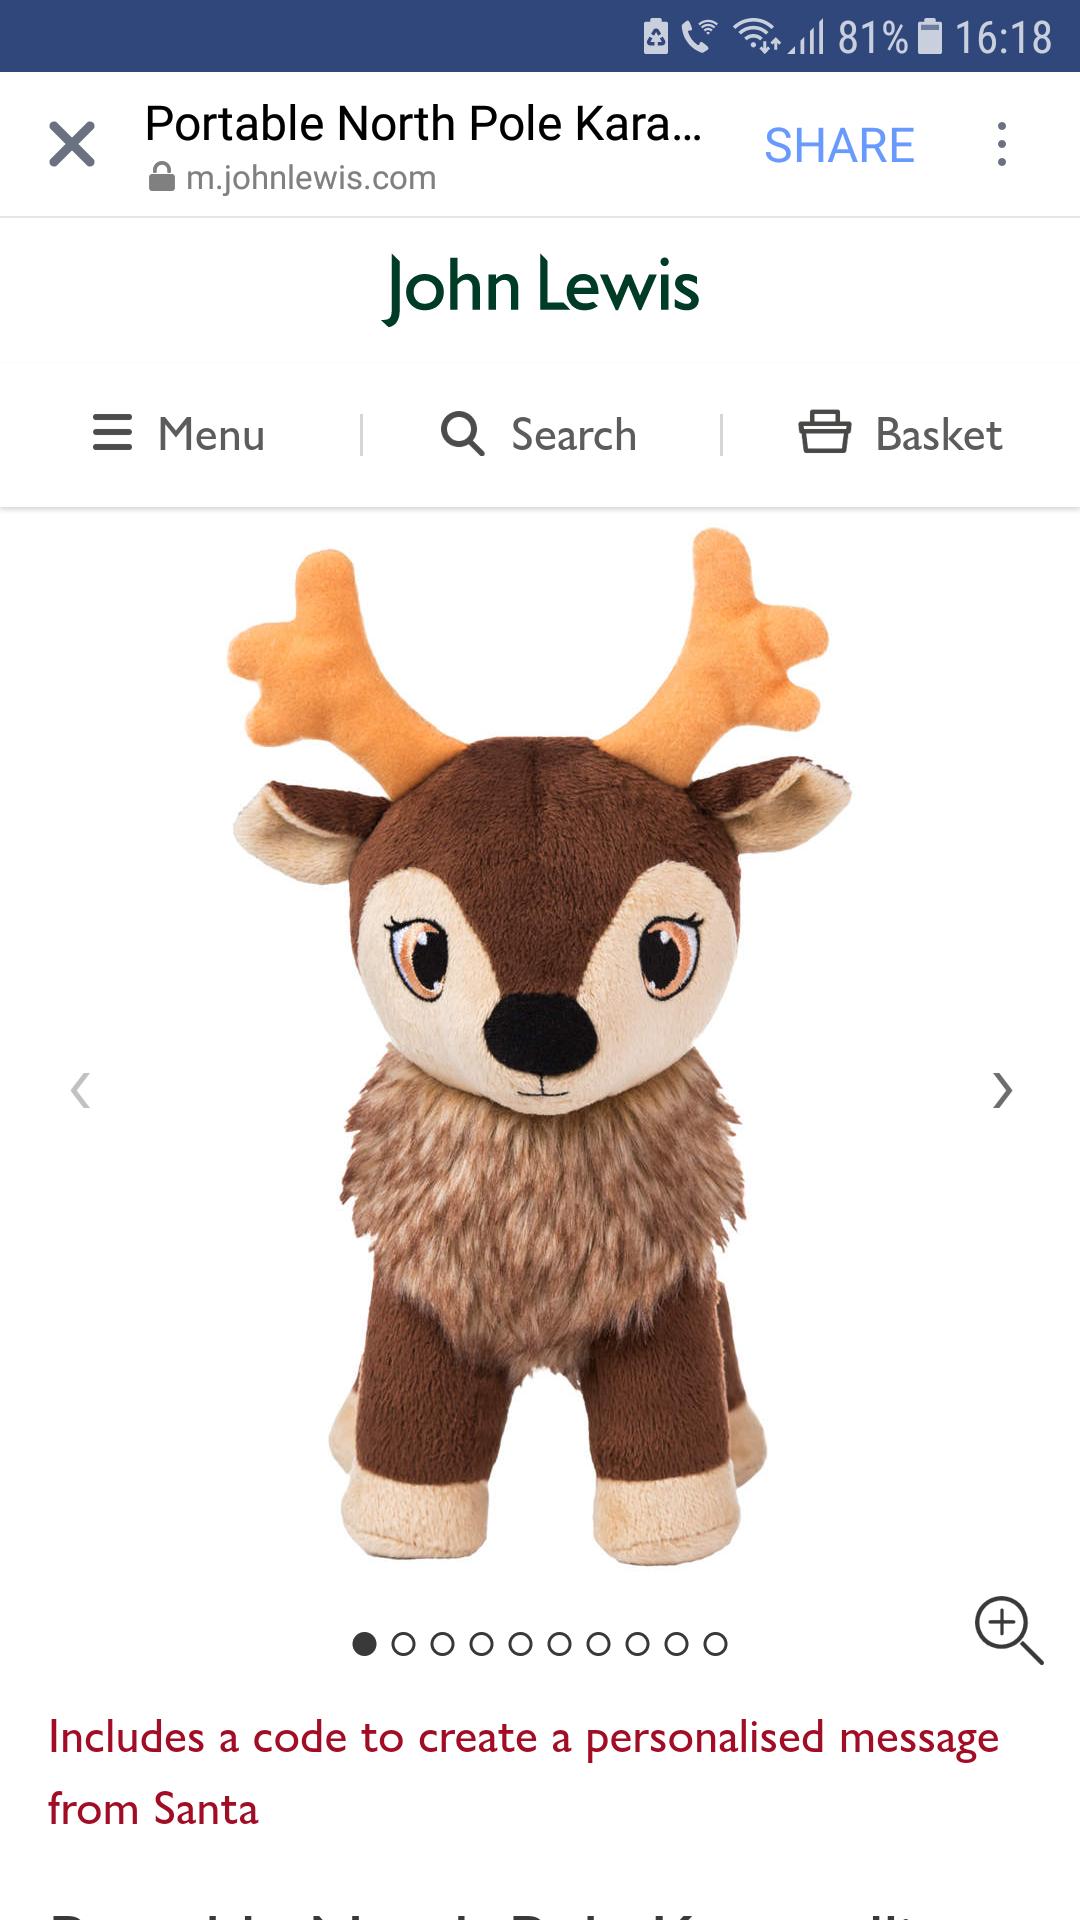 Portable North Pole Karamelli Santa's Sweetest Baby Reindeer Plush Toy & free PNP personalised video message £10 @ John Lewis - £2 c&c